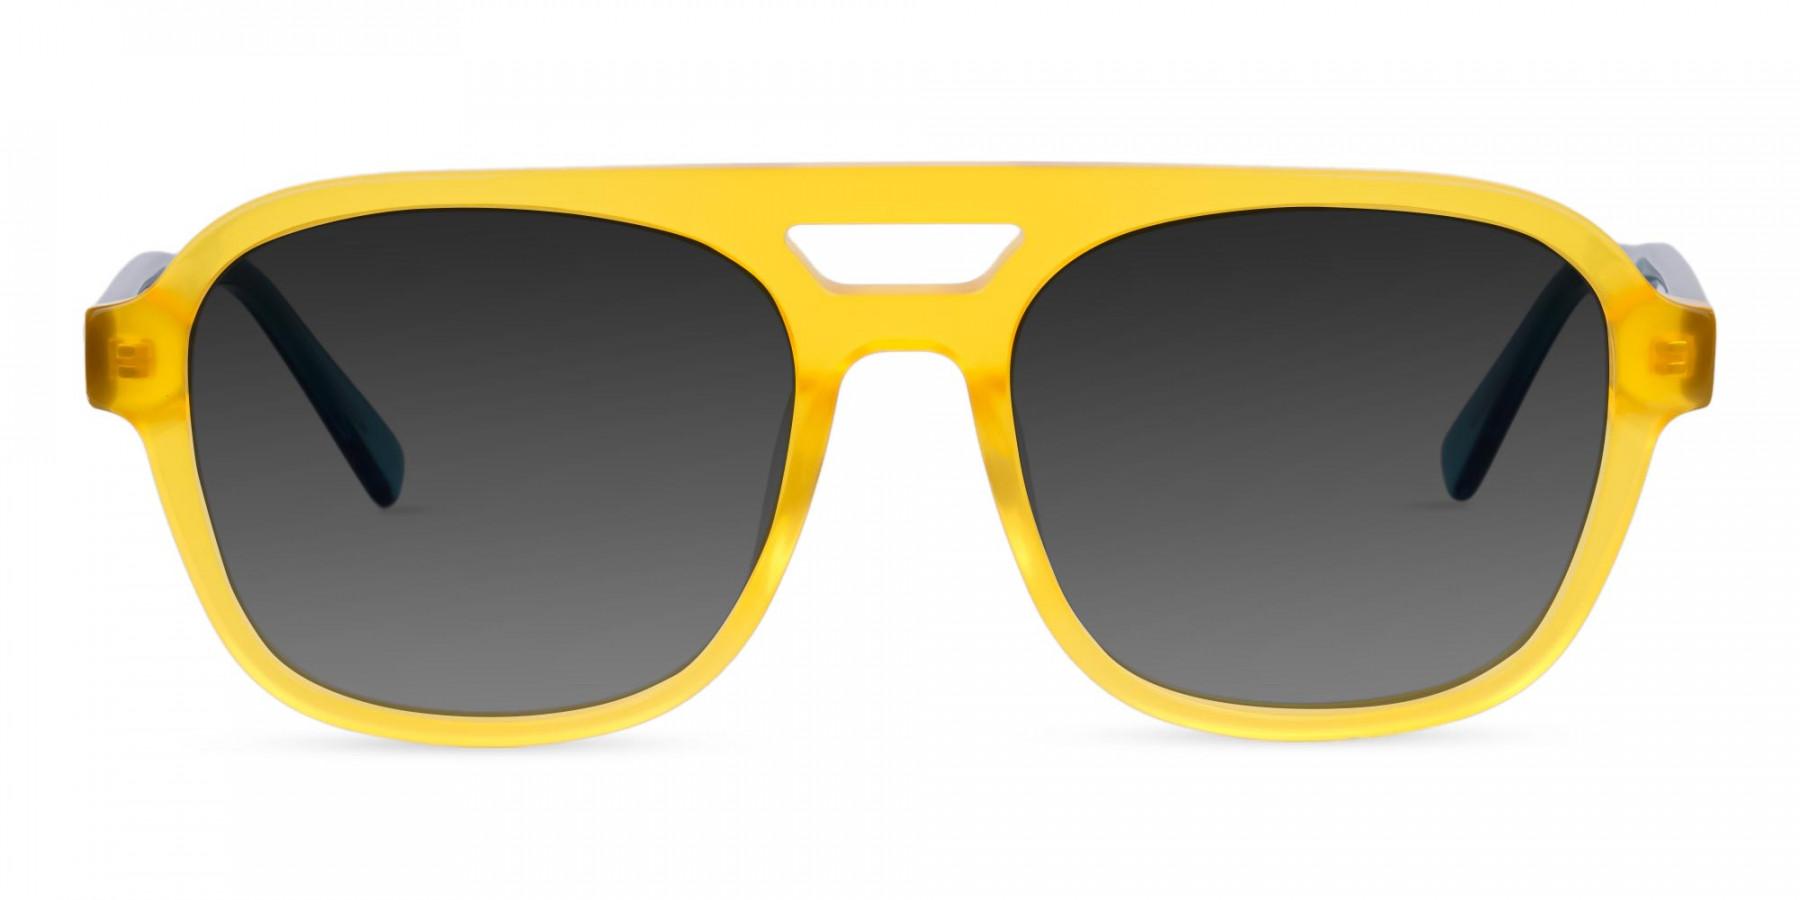 Yellow-Aviator-Sunglasses-with-Grey-Tint-3